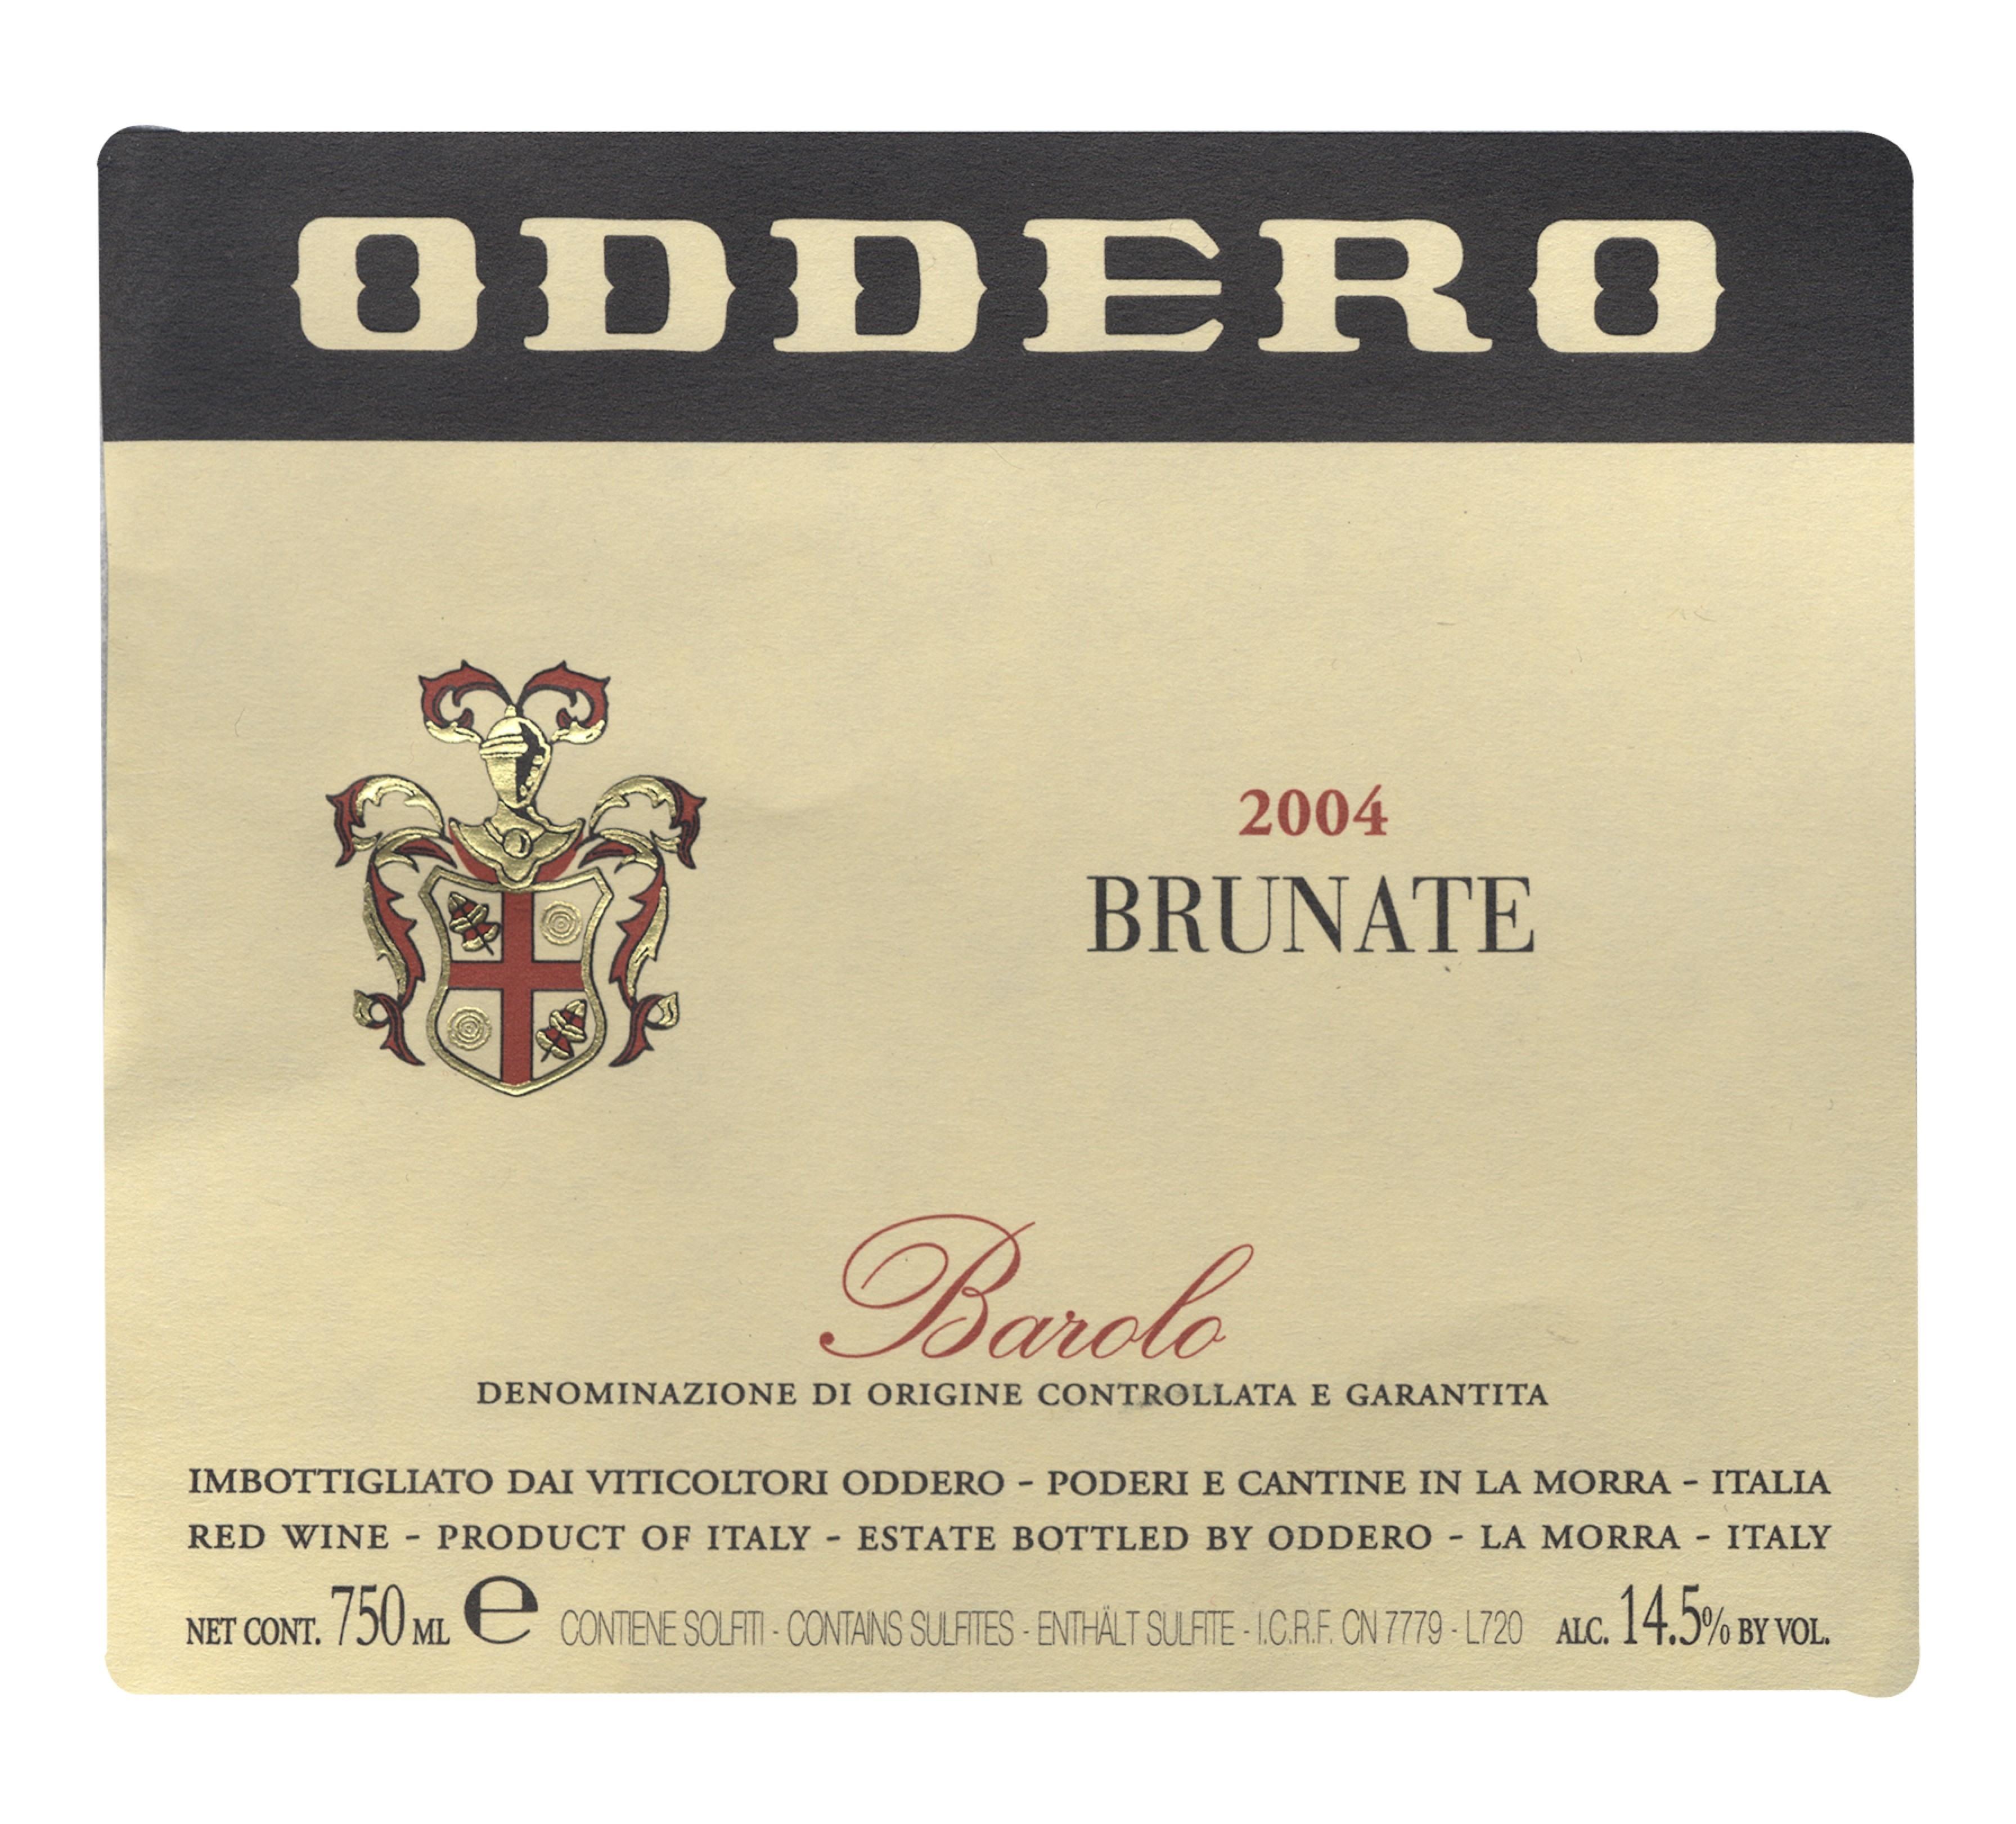 Barolo Brunate 2004 Barolo Brunate Oddero